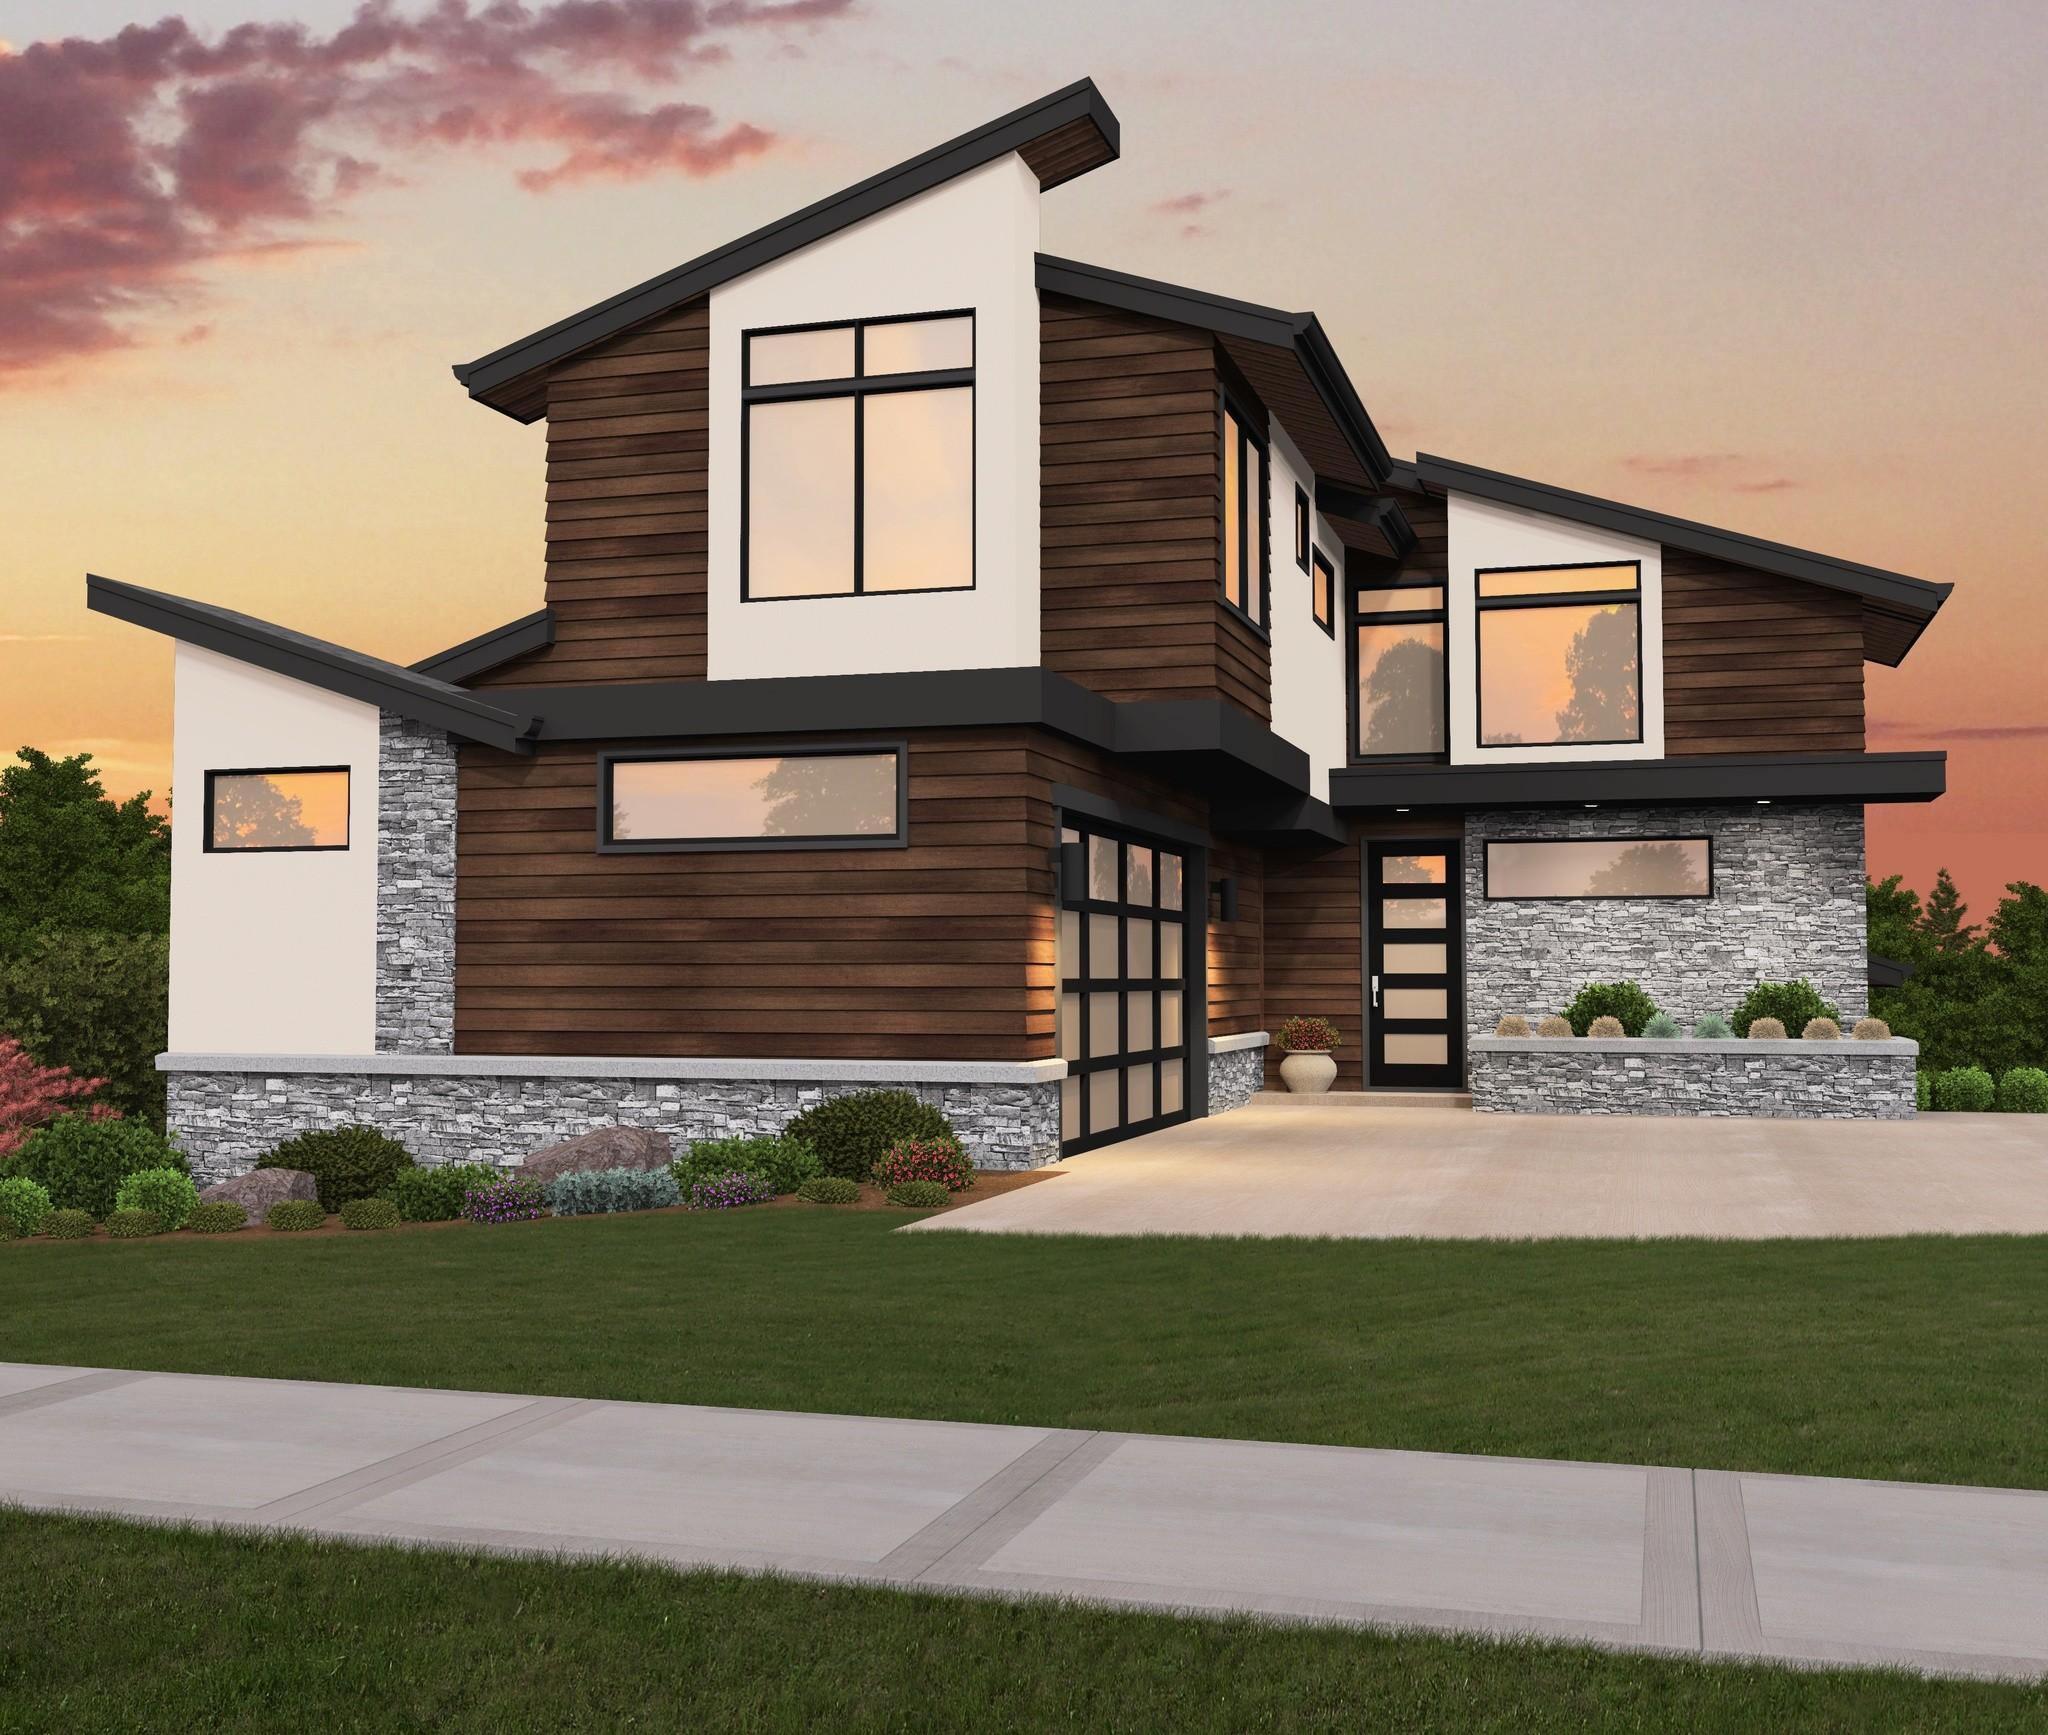 Detached Garage Plan By Mark Stewart Home Design: Narrow Downhill Modern House Plan